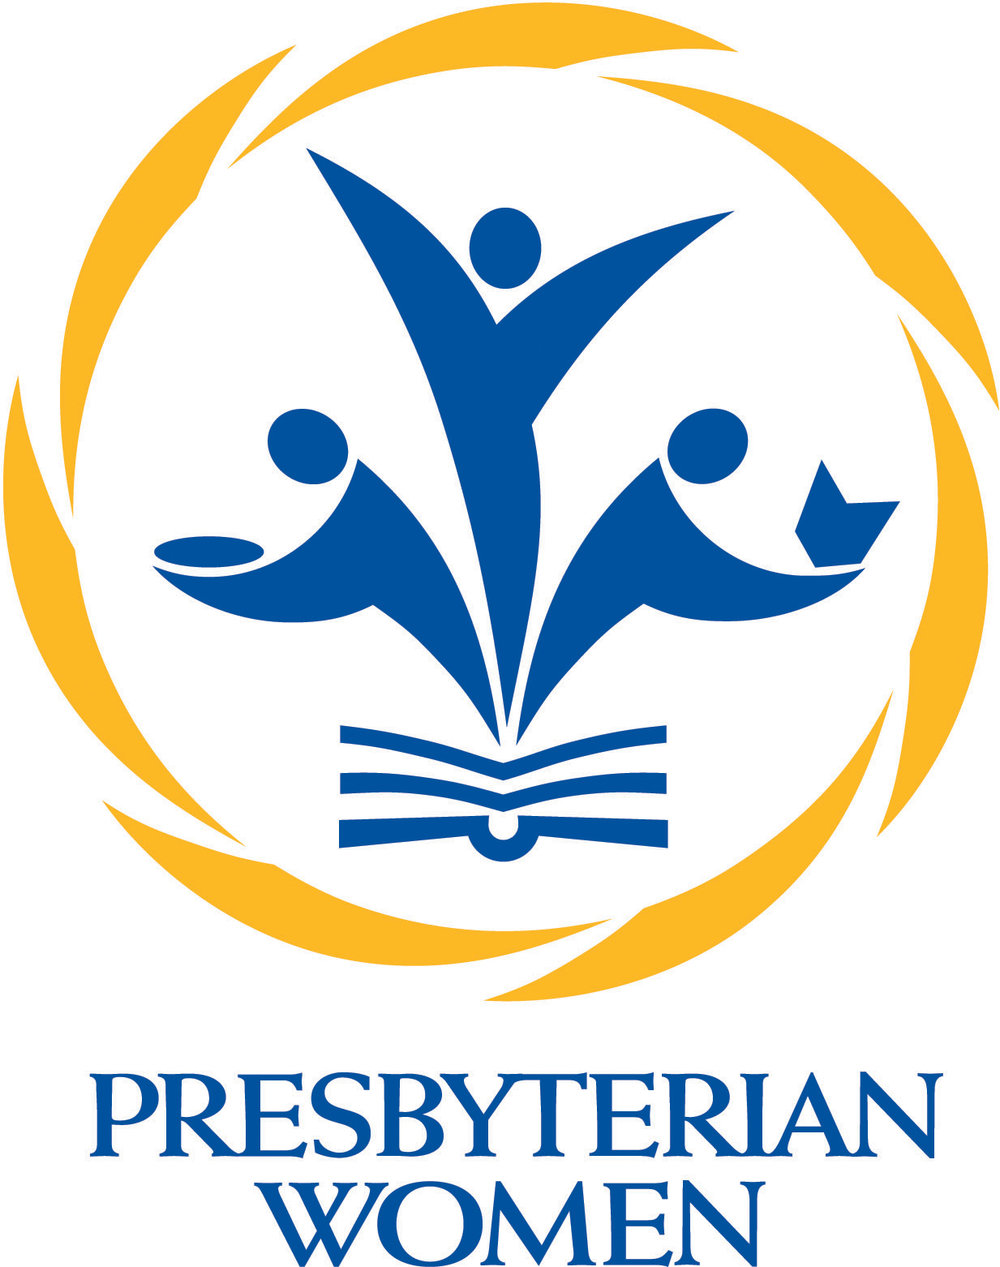 PW-blue.yellow-logo.jpg